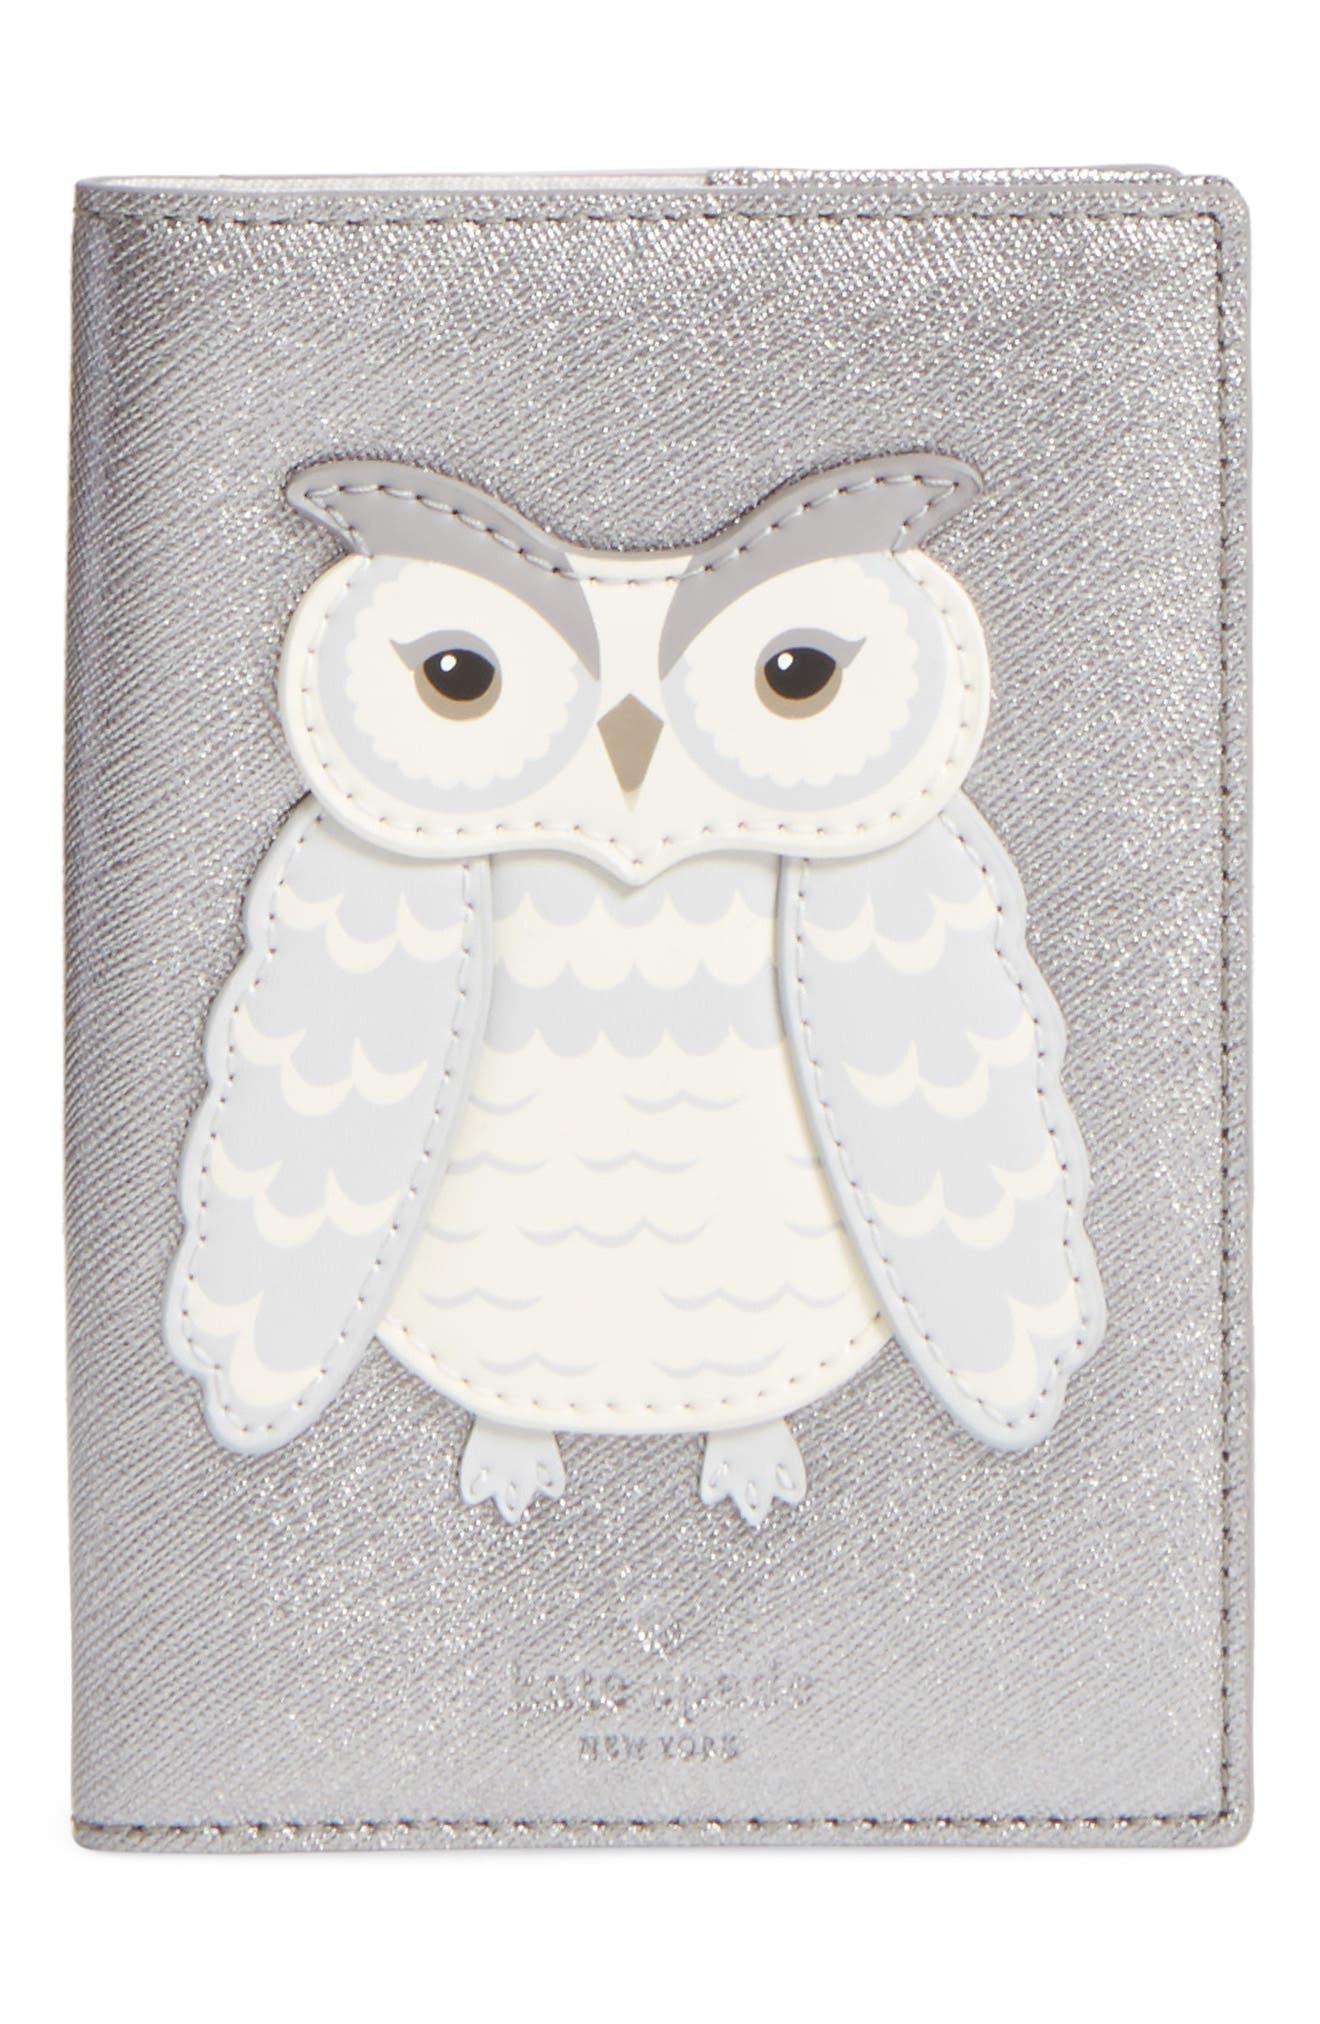 Main Image - kate spade new york starbright owl leather passport case